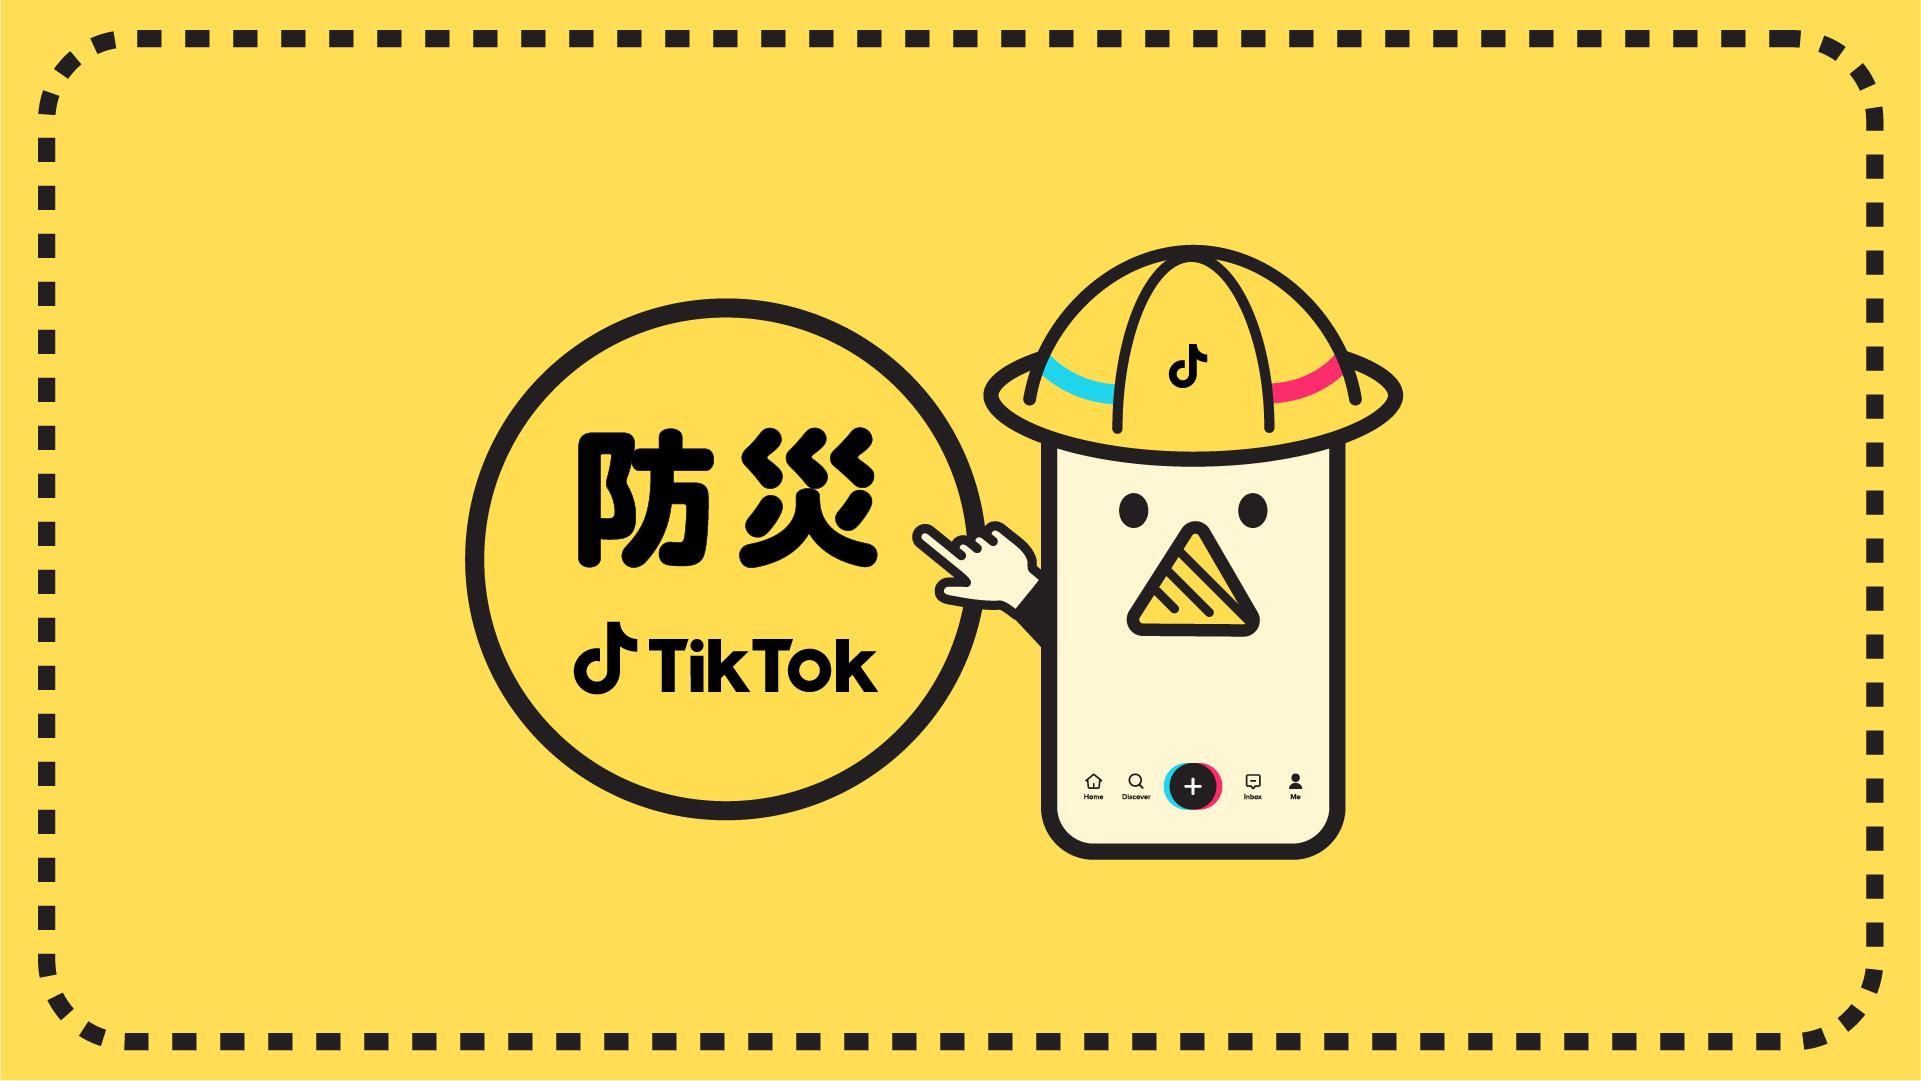 TikTok、行政機関と連携した世界初の「防災TikTok」を3月31日に開始!第一弾は気象庁と連携